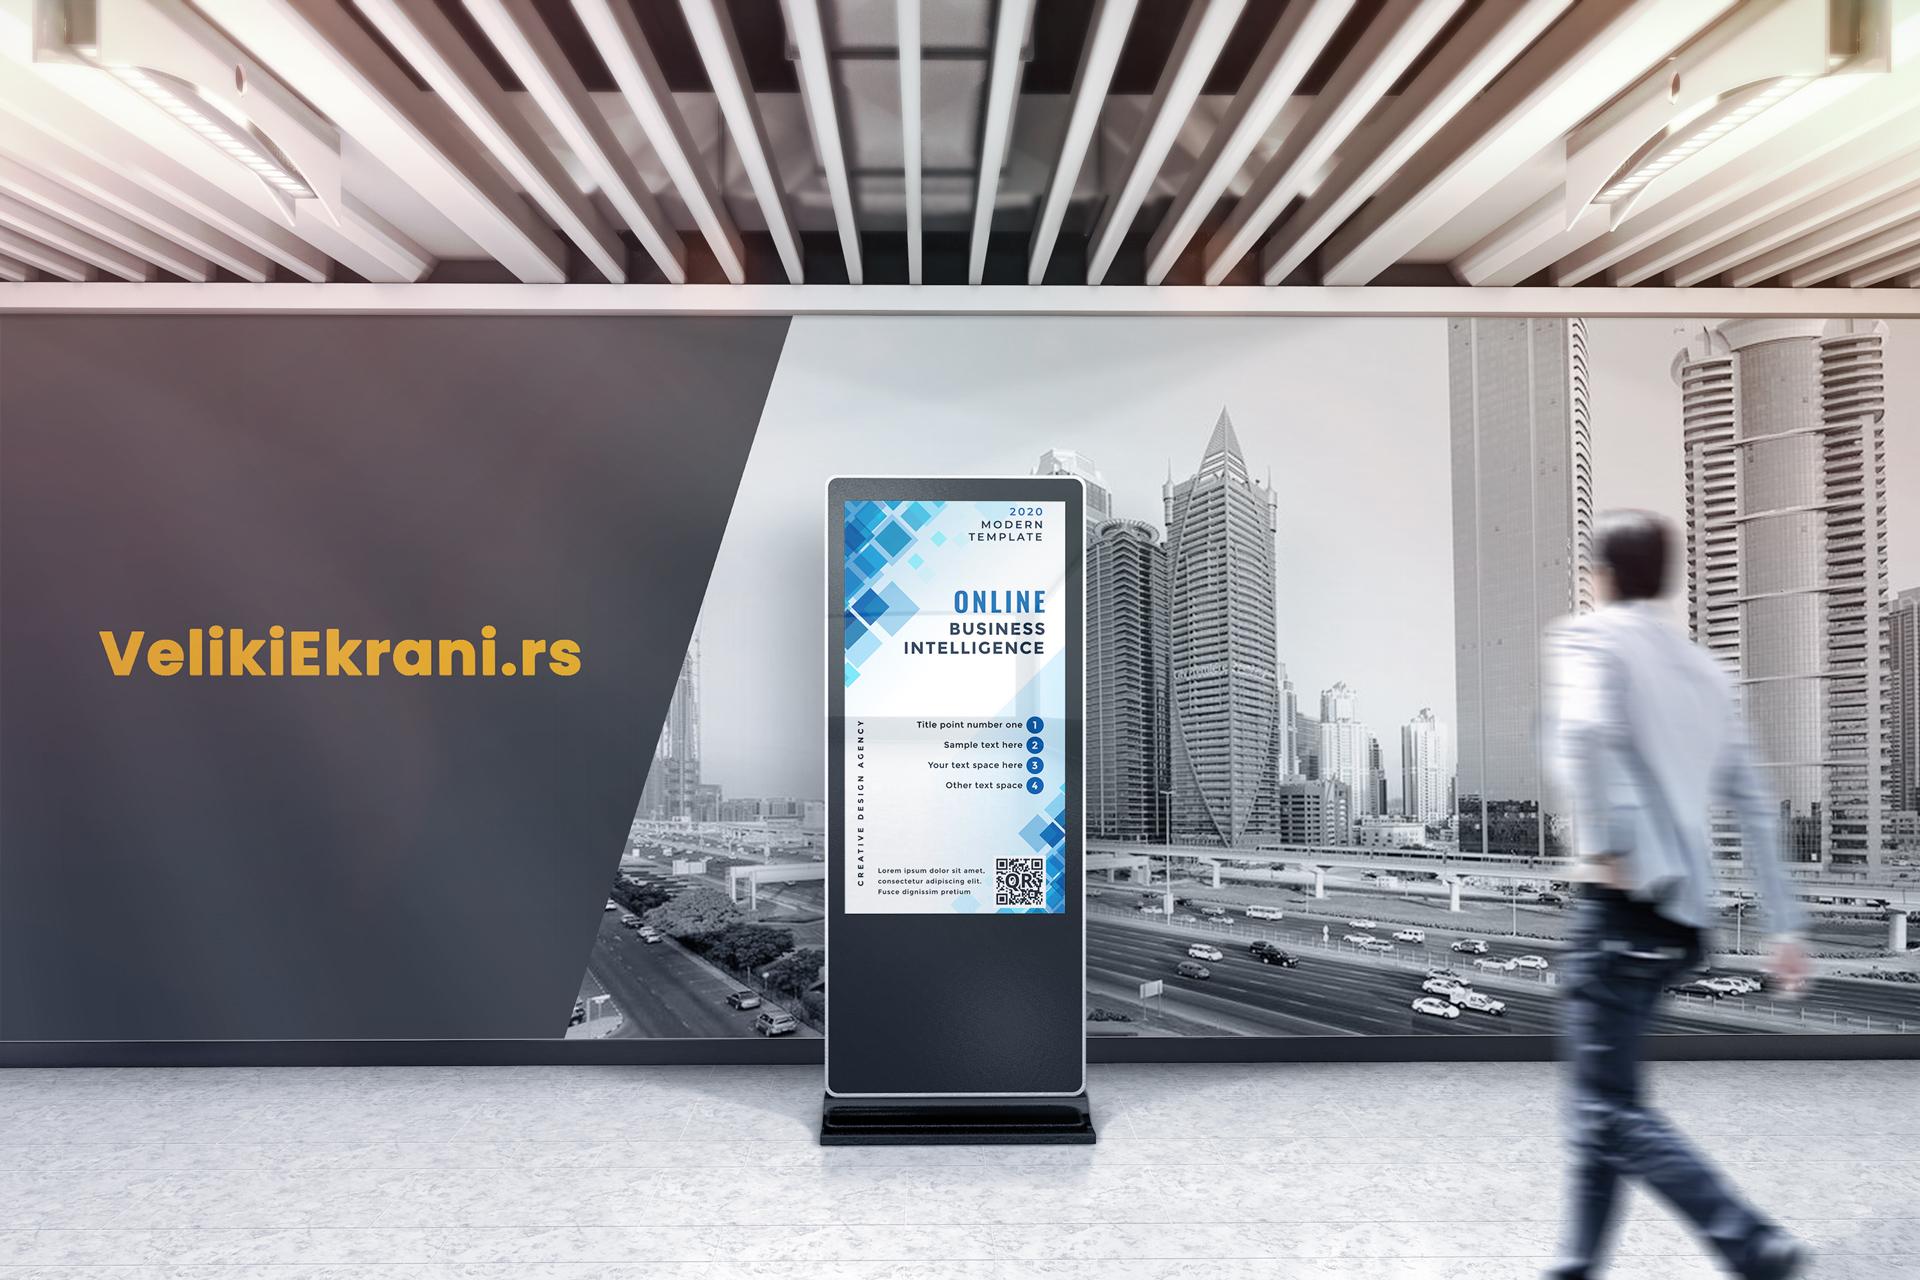 Digital signage - primena